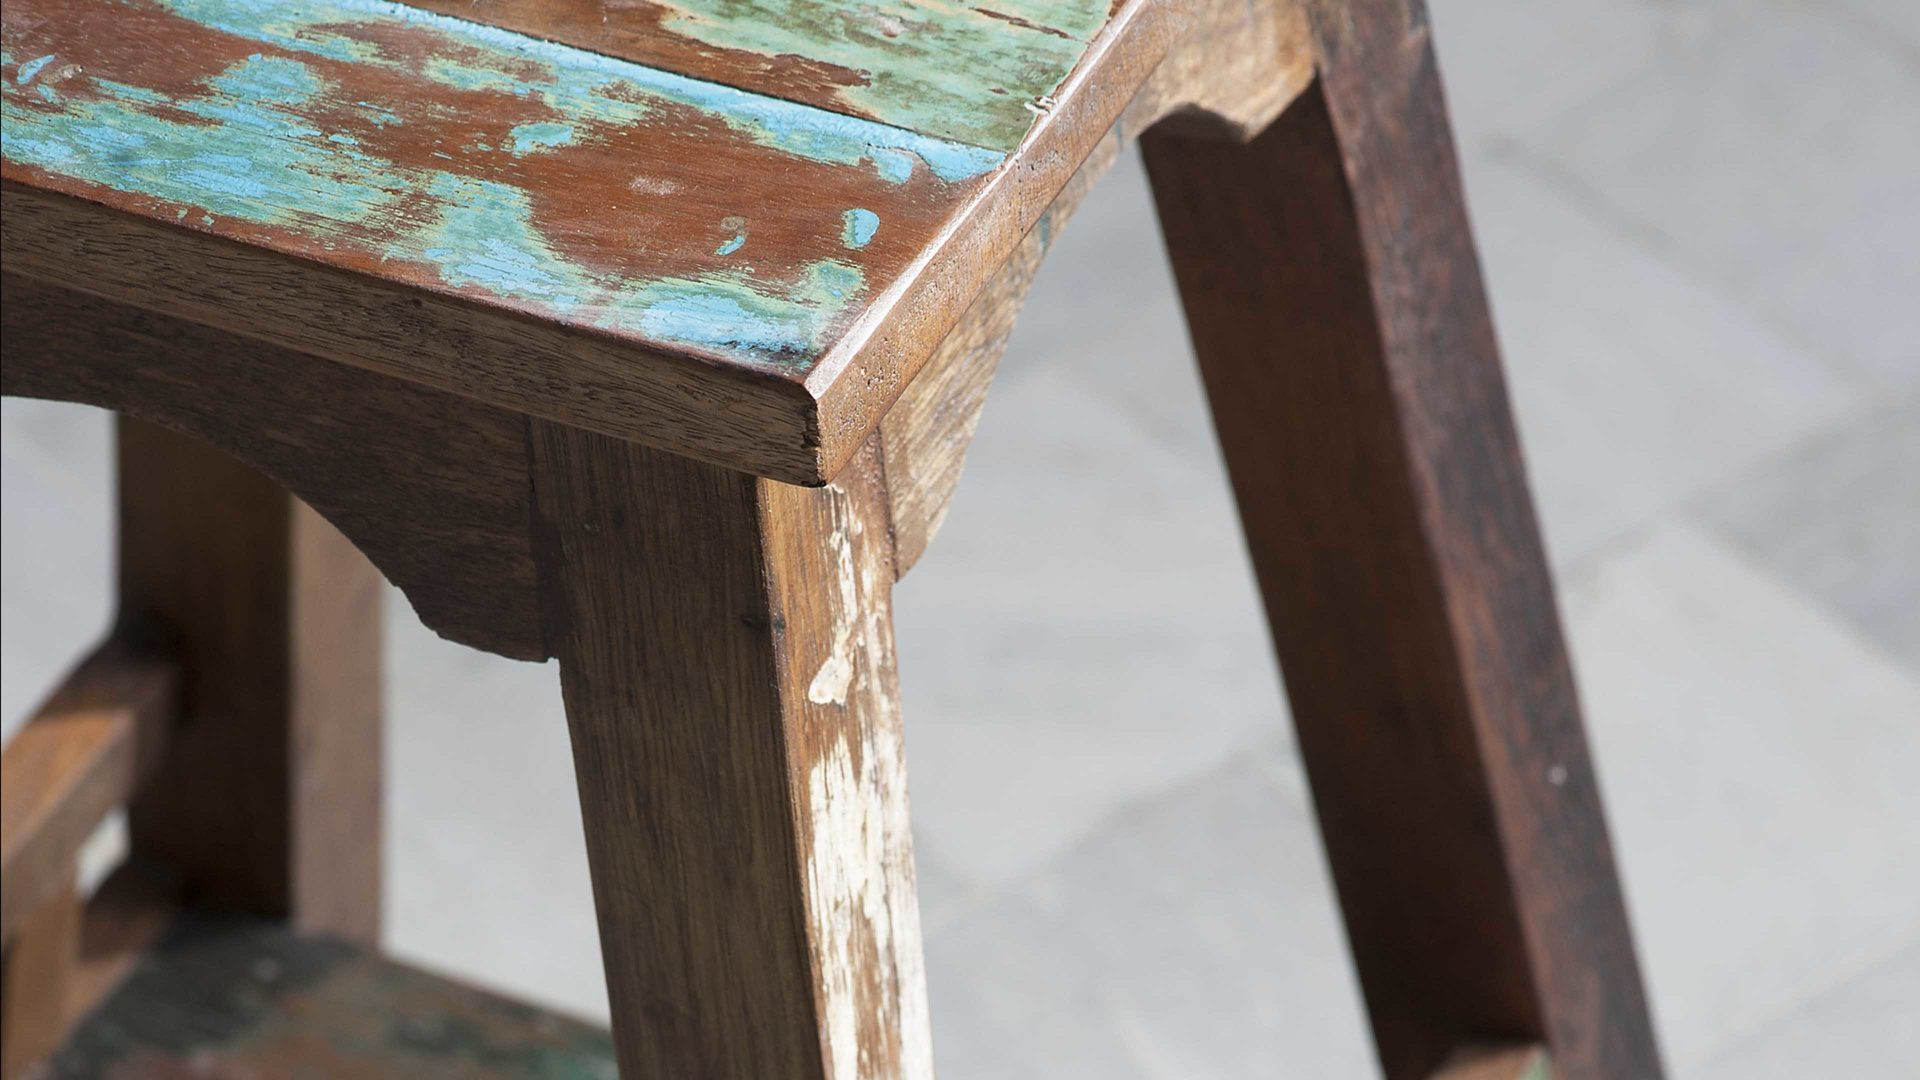 Holzhocker im Shabby-Vintage-Look, Altholz mit Farbspuren - Höhe ca ...